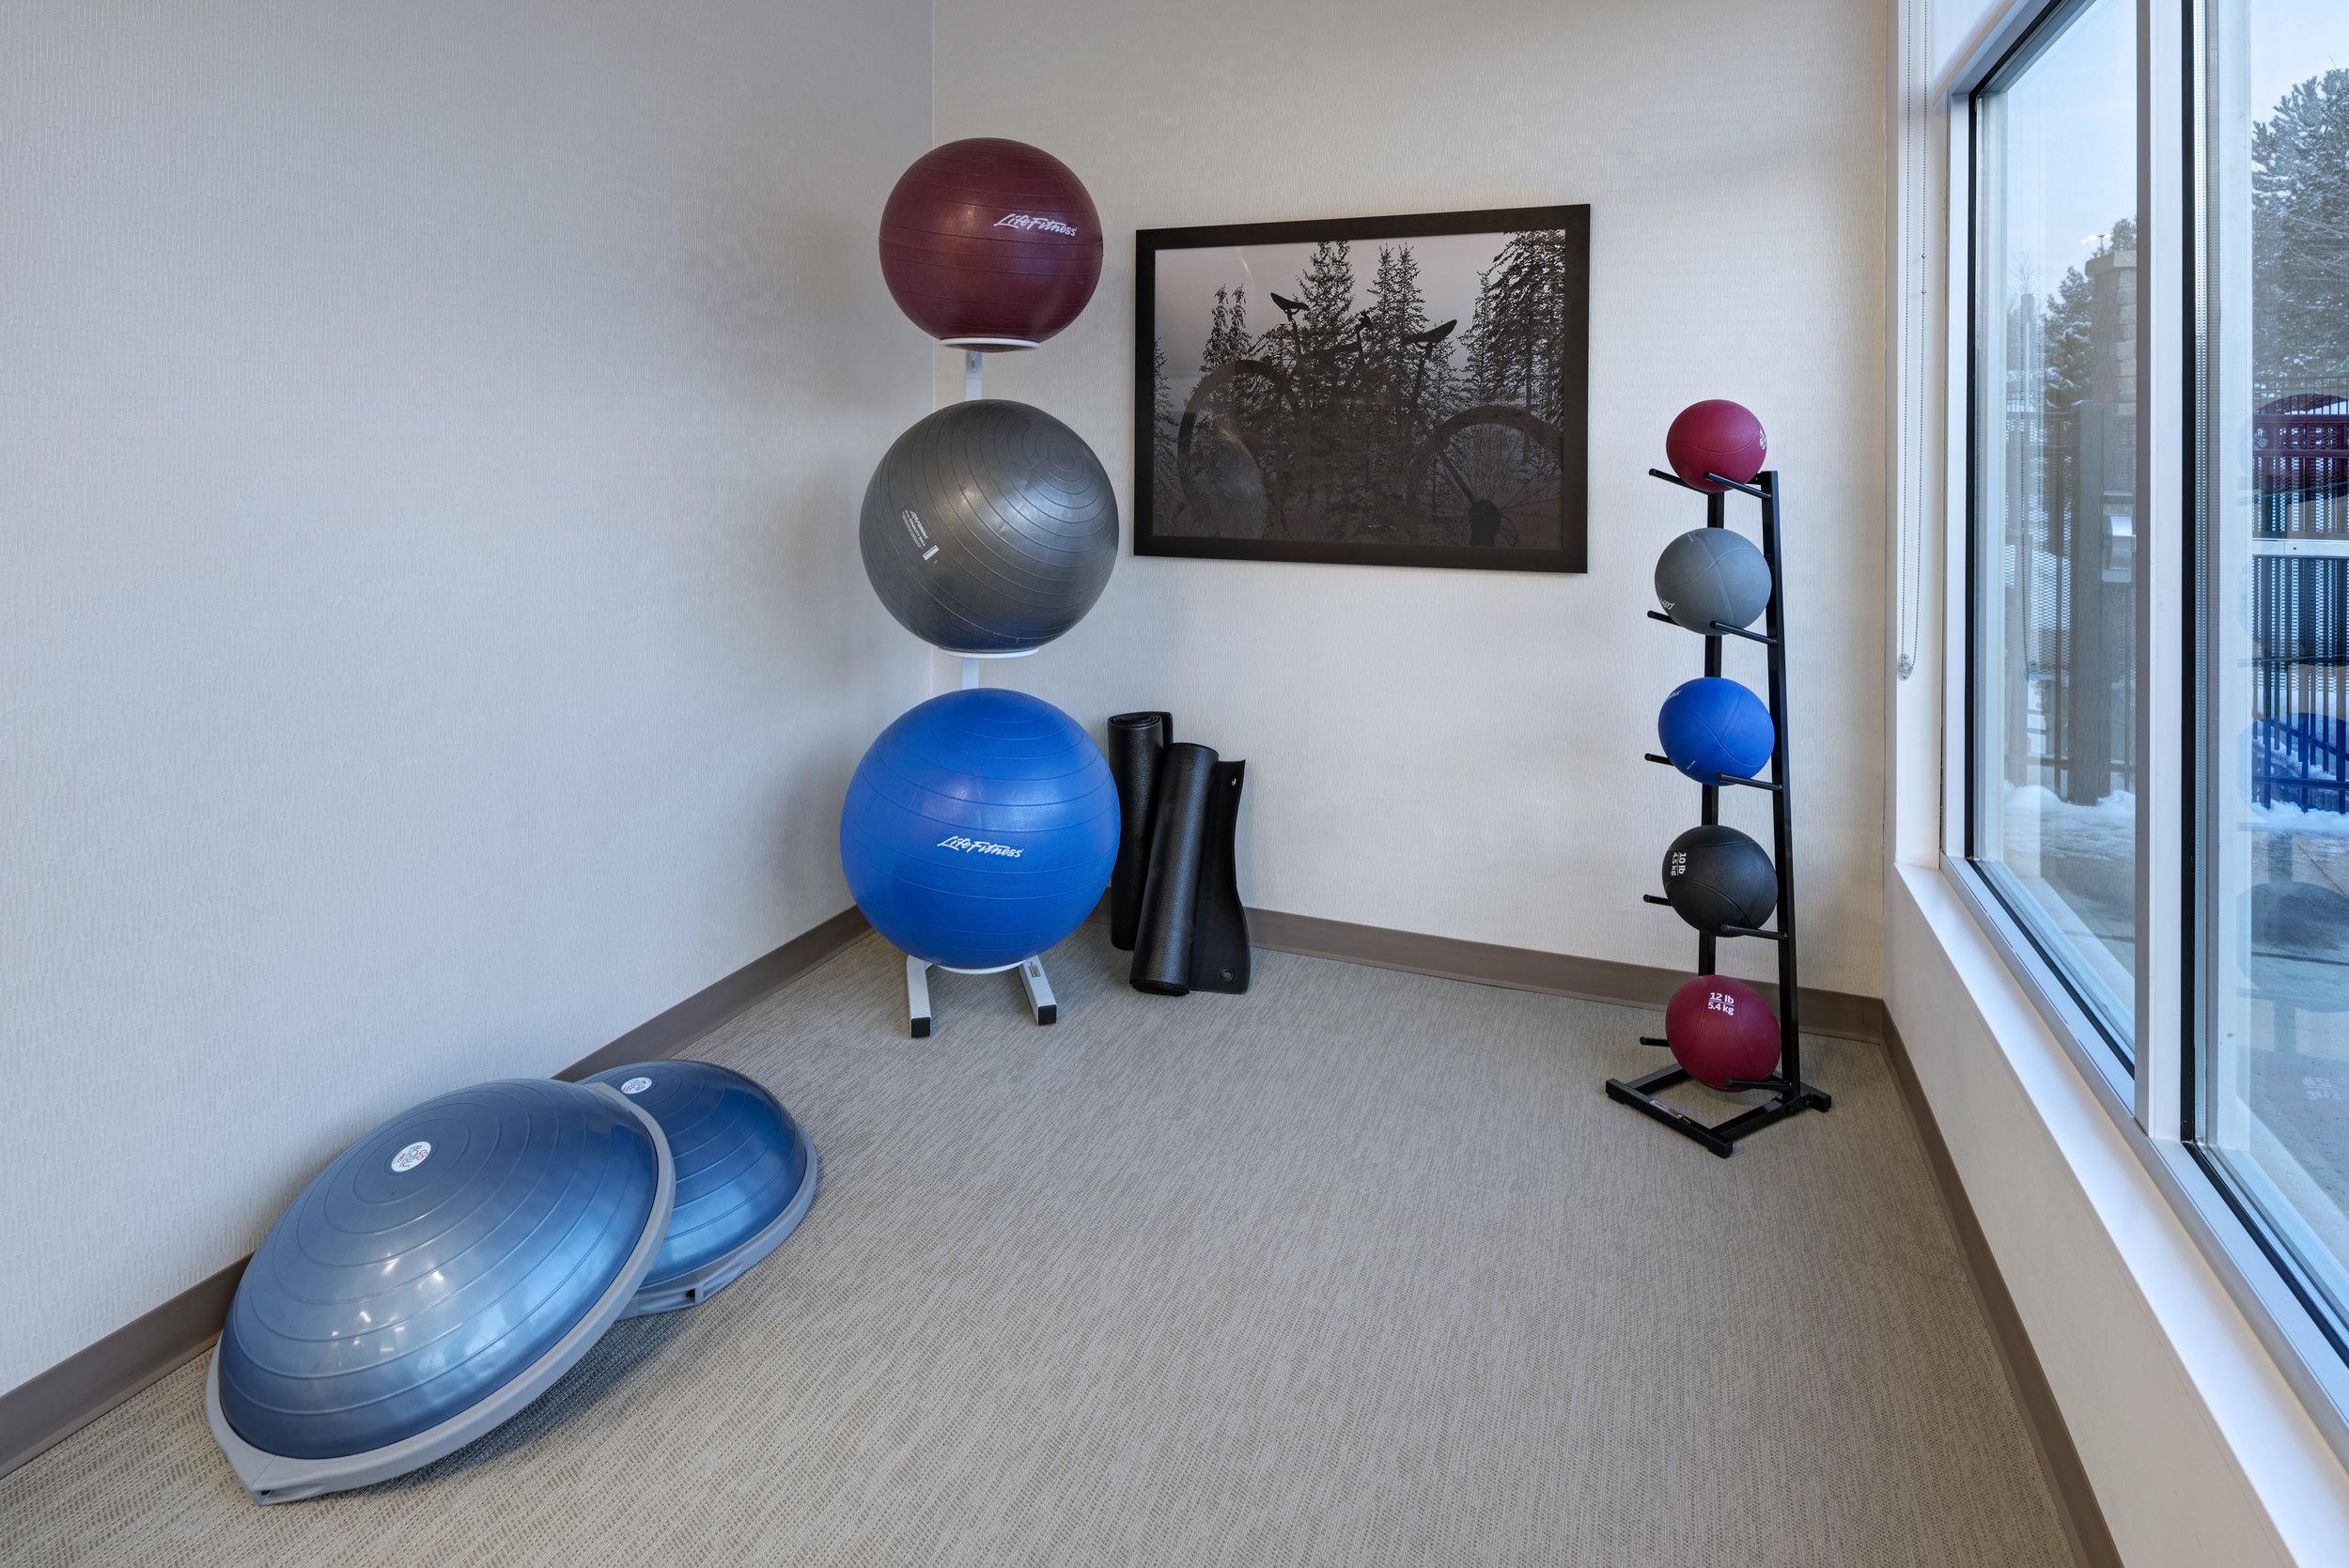 fitness3 copy.jpg